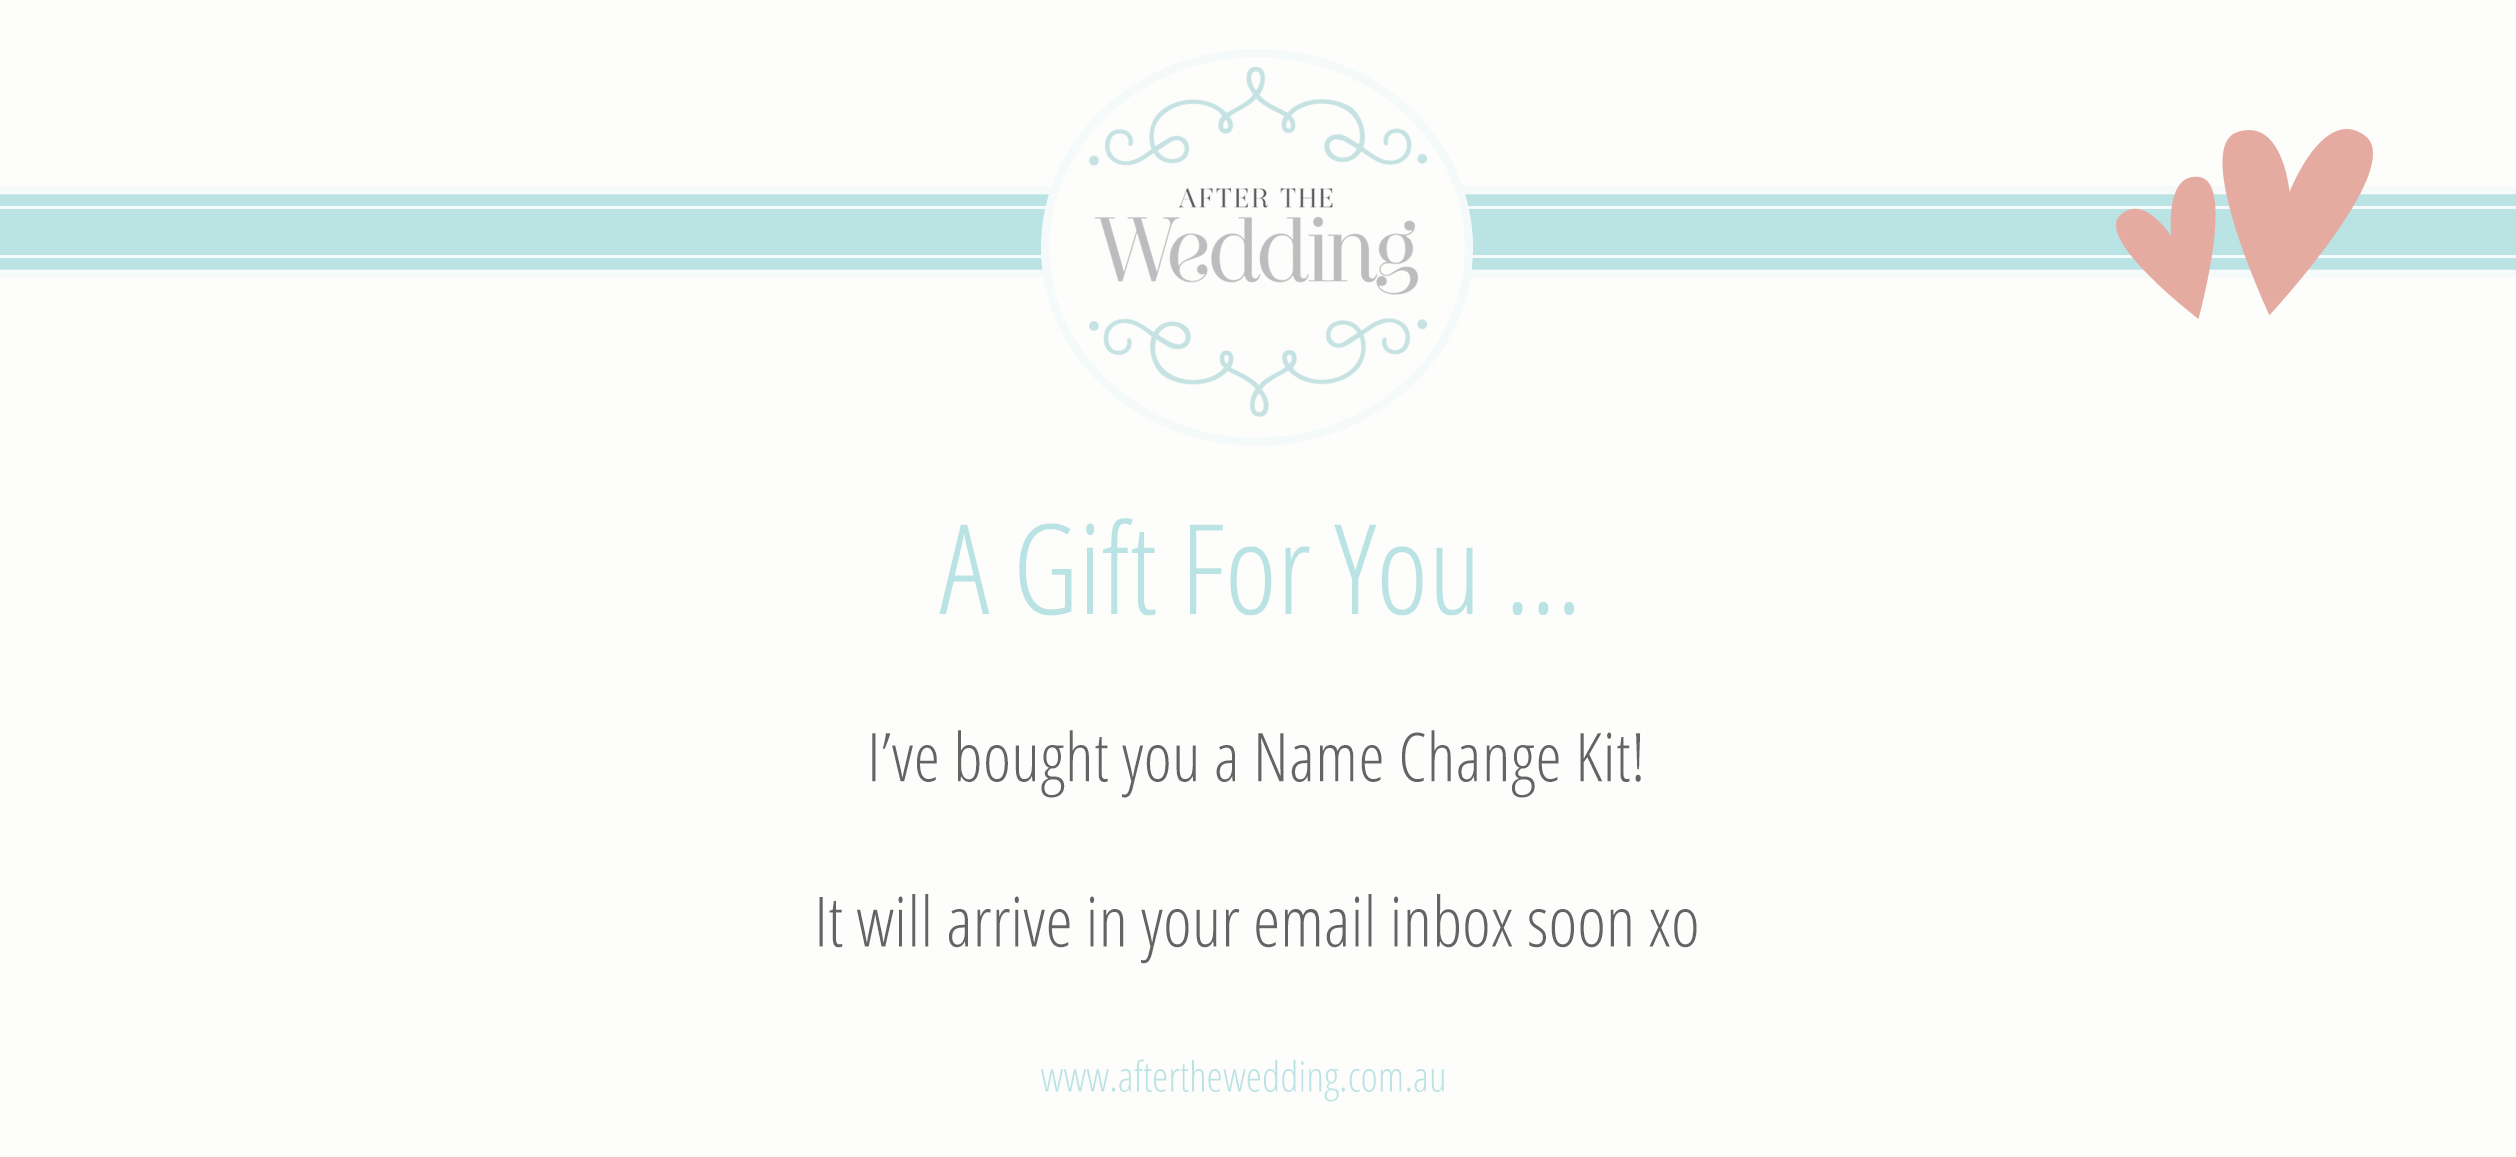 Honeymoon Vouchers As Wedding Gifts: Name Change Kit Gift Vouchers